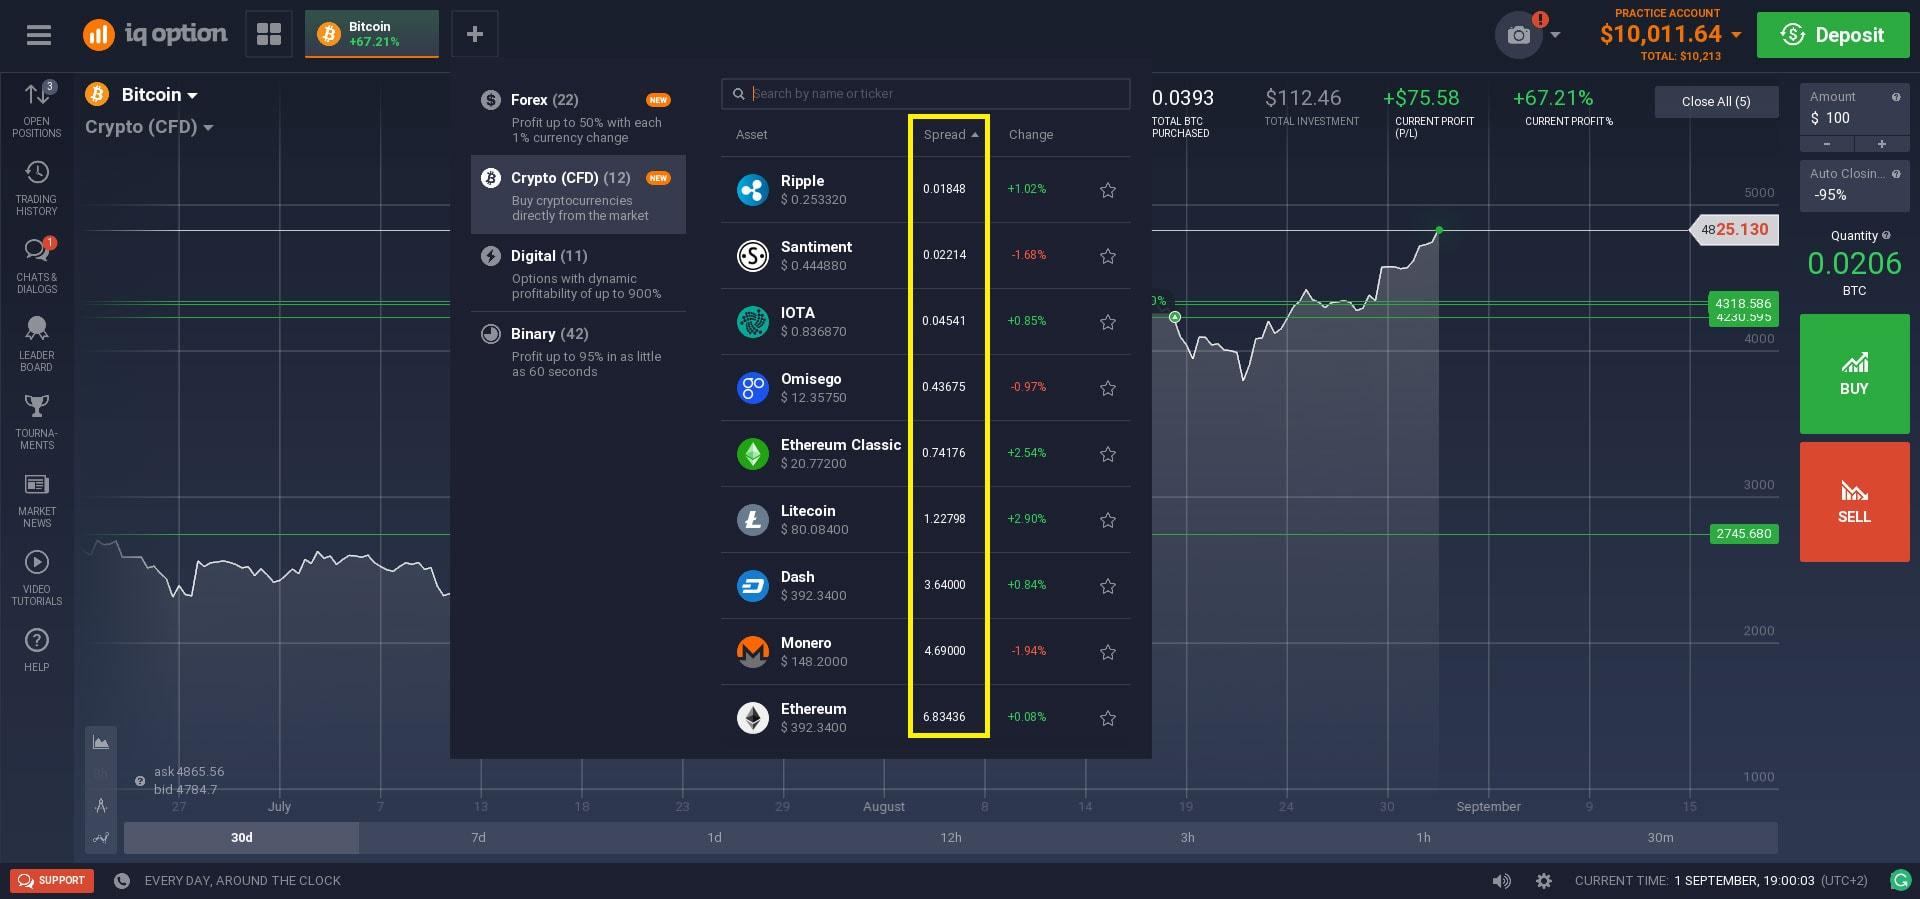 Event Calendar Crypto : Iq option crypto trading list of all cryptocurrencies